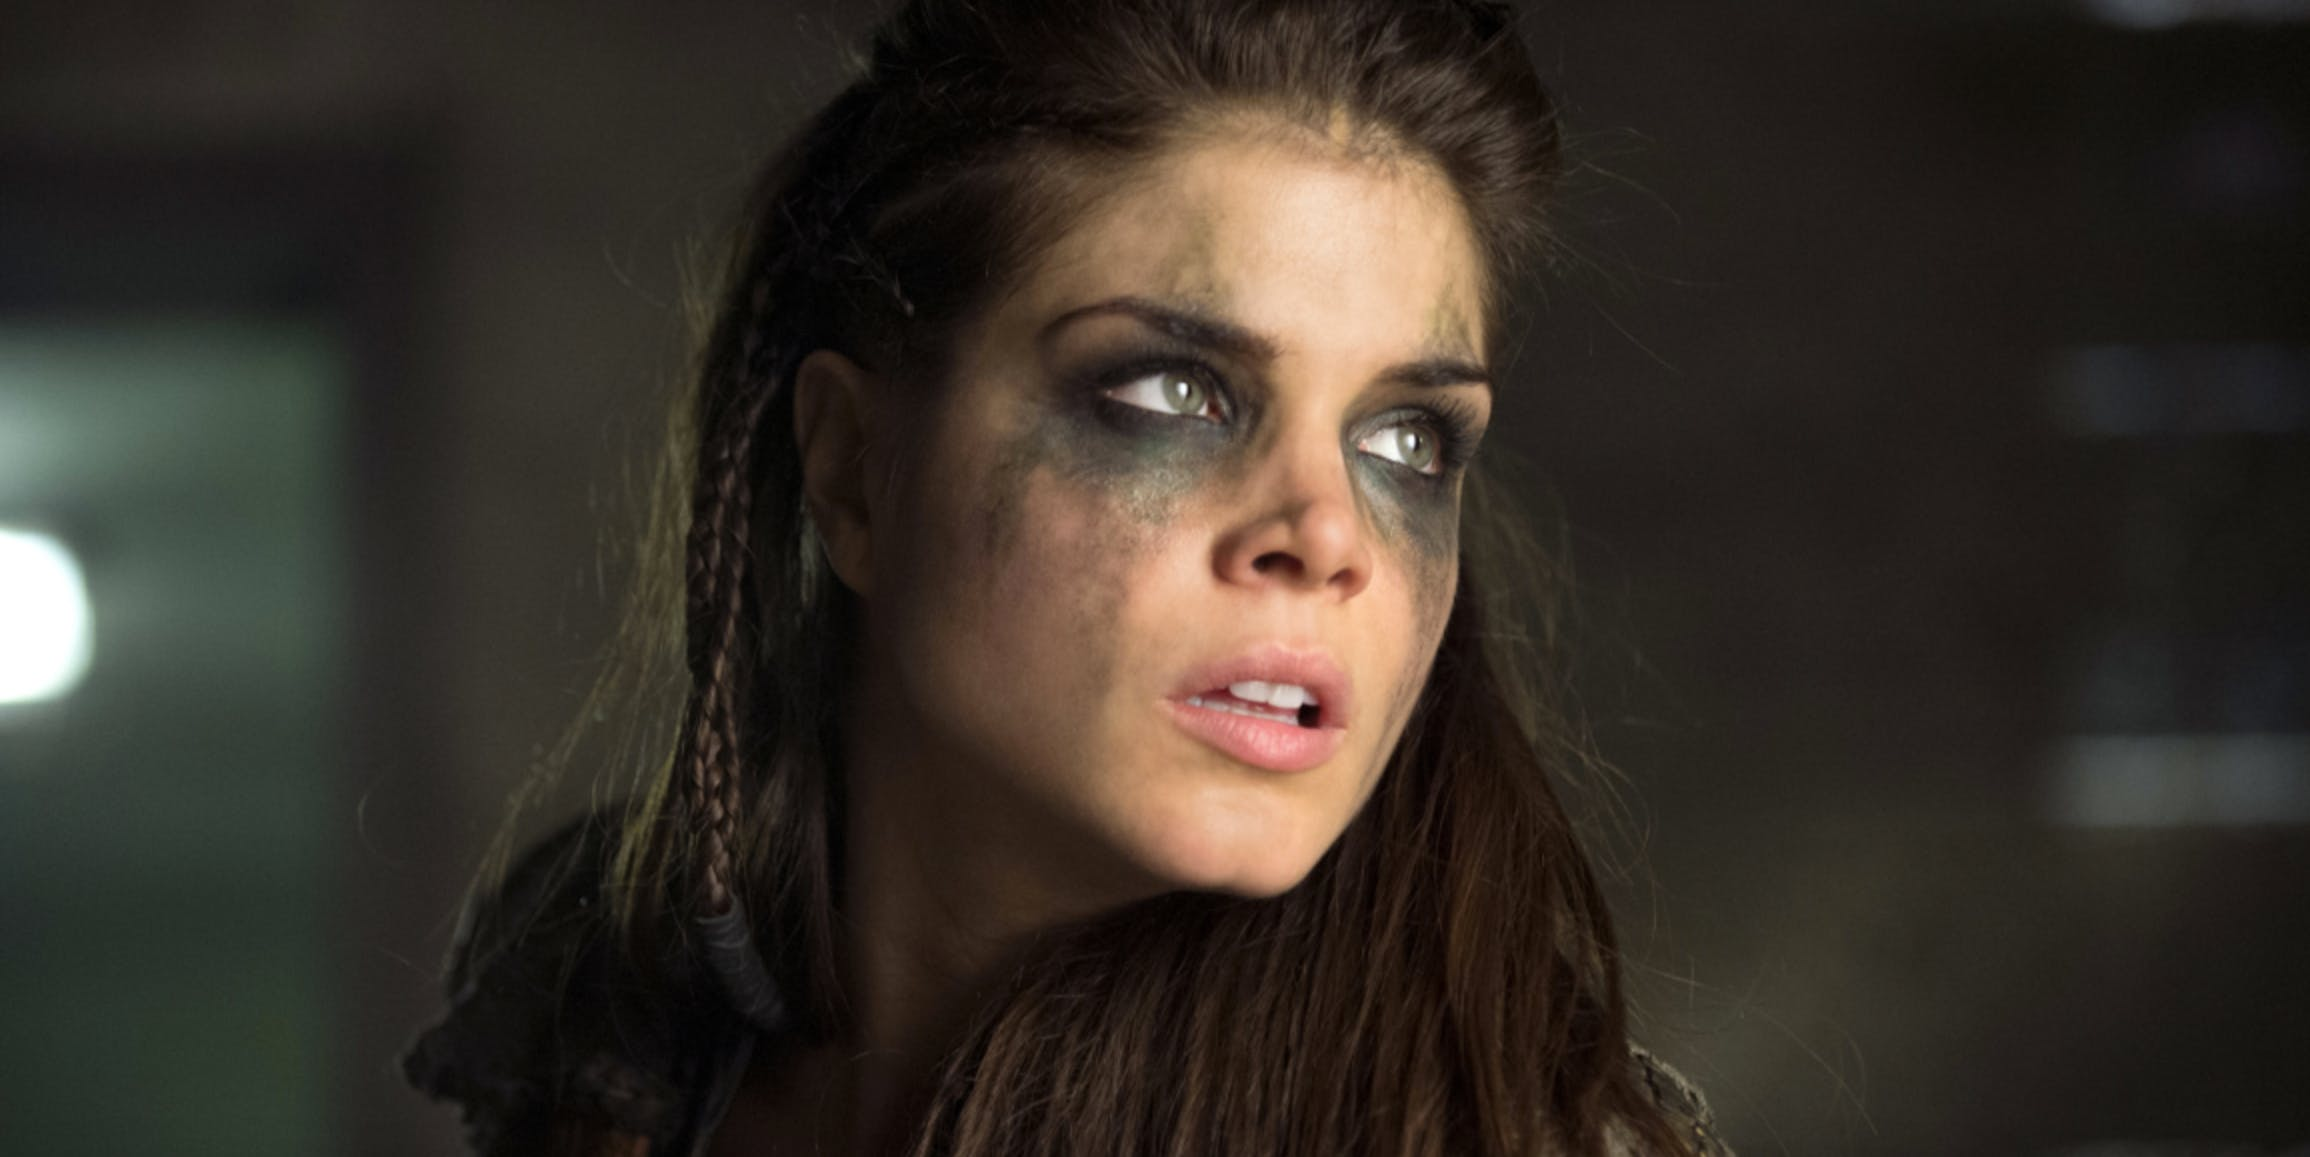 Octavia in 'The 100 Season 4'